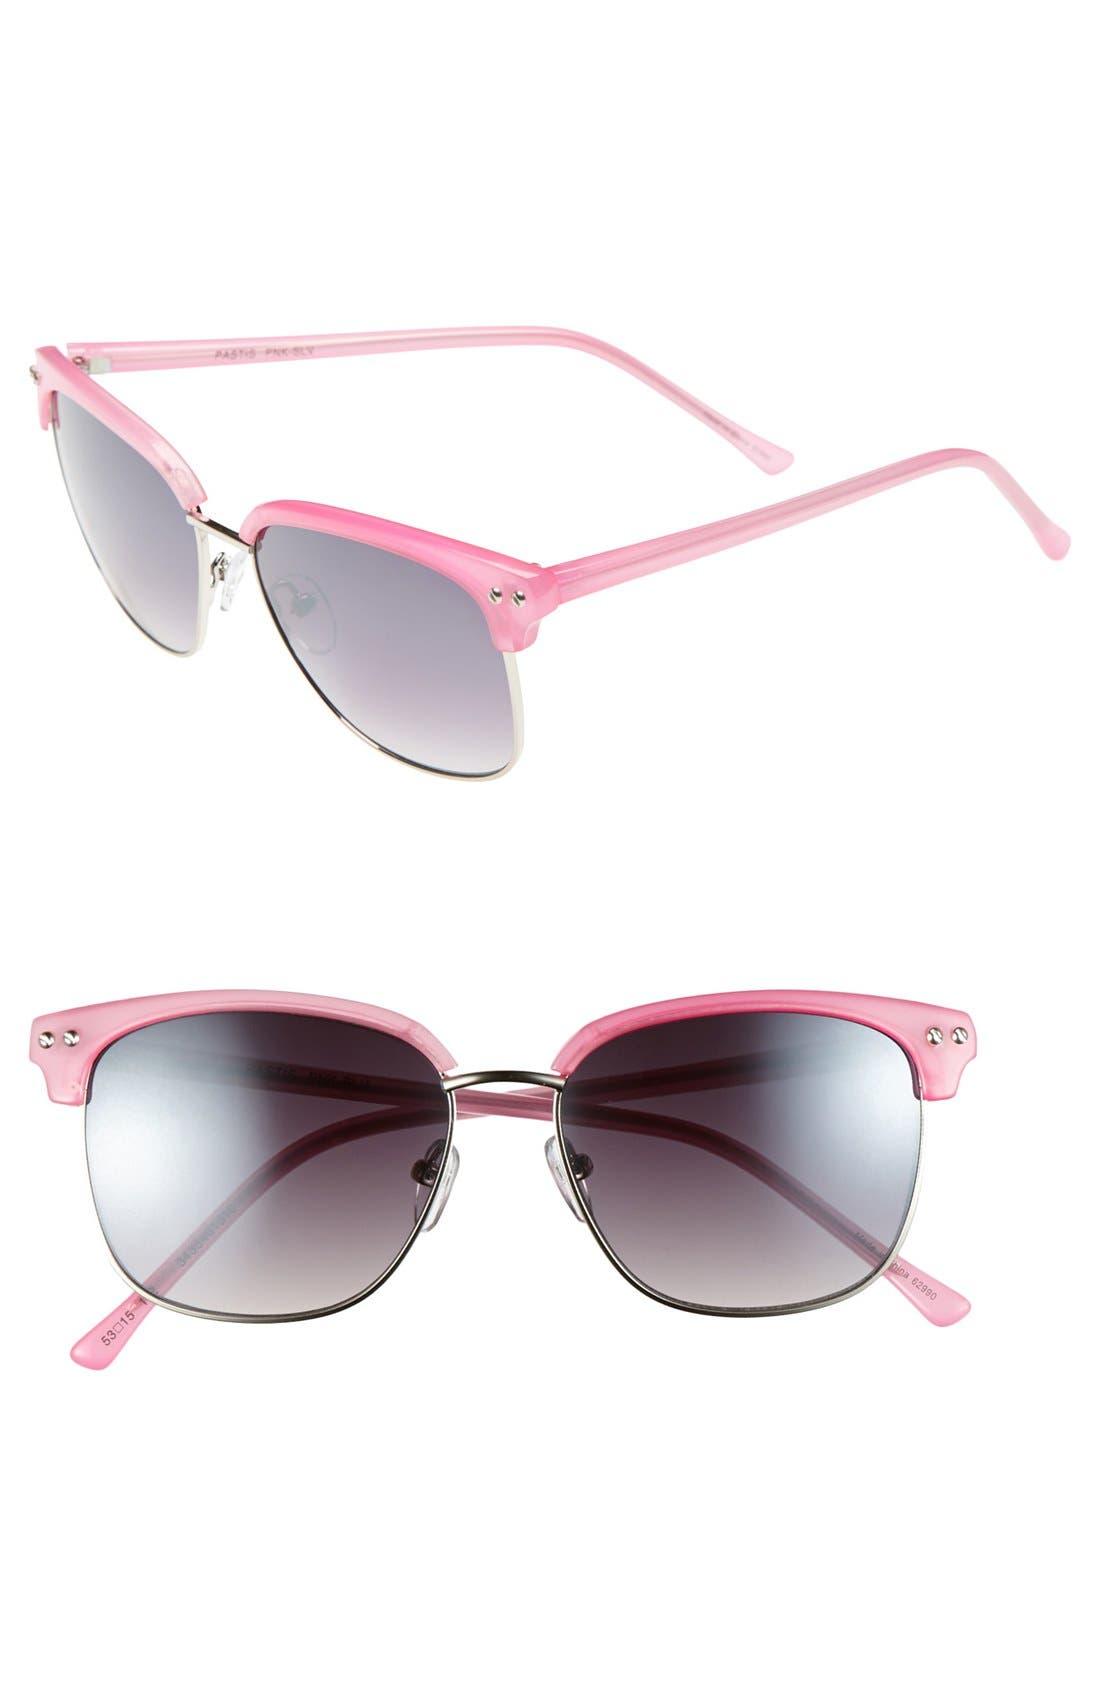 Main Image - Outlook Eyewear 'Pastis' 53mm Sunglasses